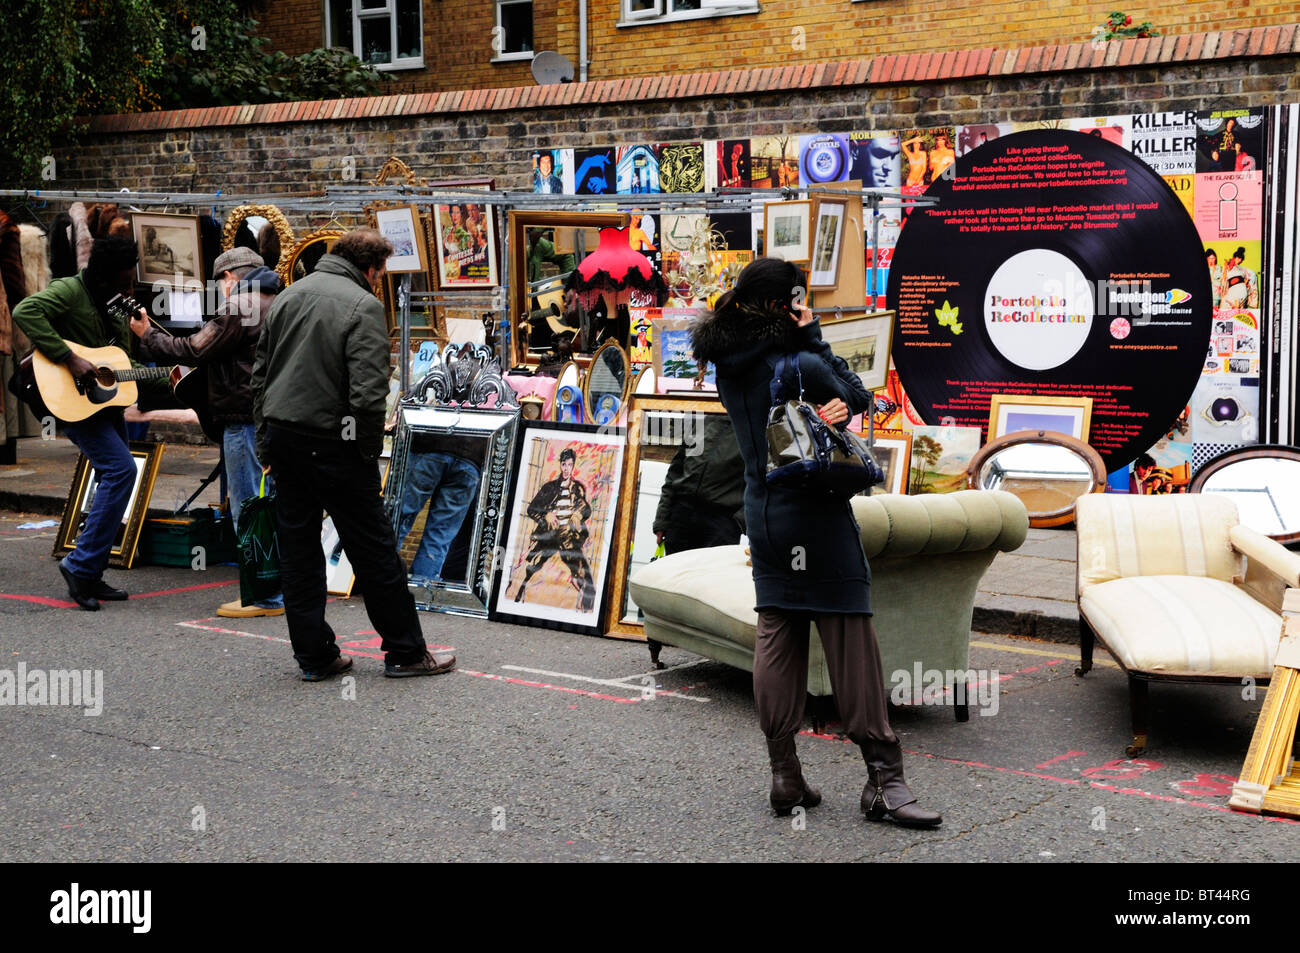 Portobello ReCollection Wall decorated as LP  Vinyl Record Album Covers, Portobello Road, Notting Hill, London, - Stock Image